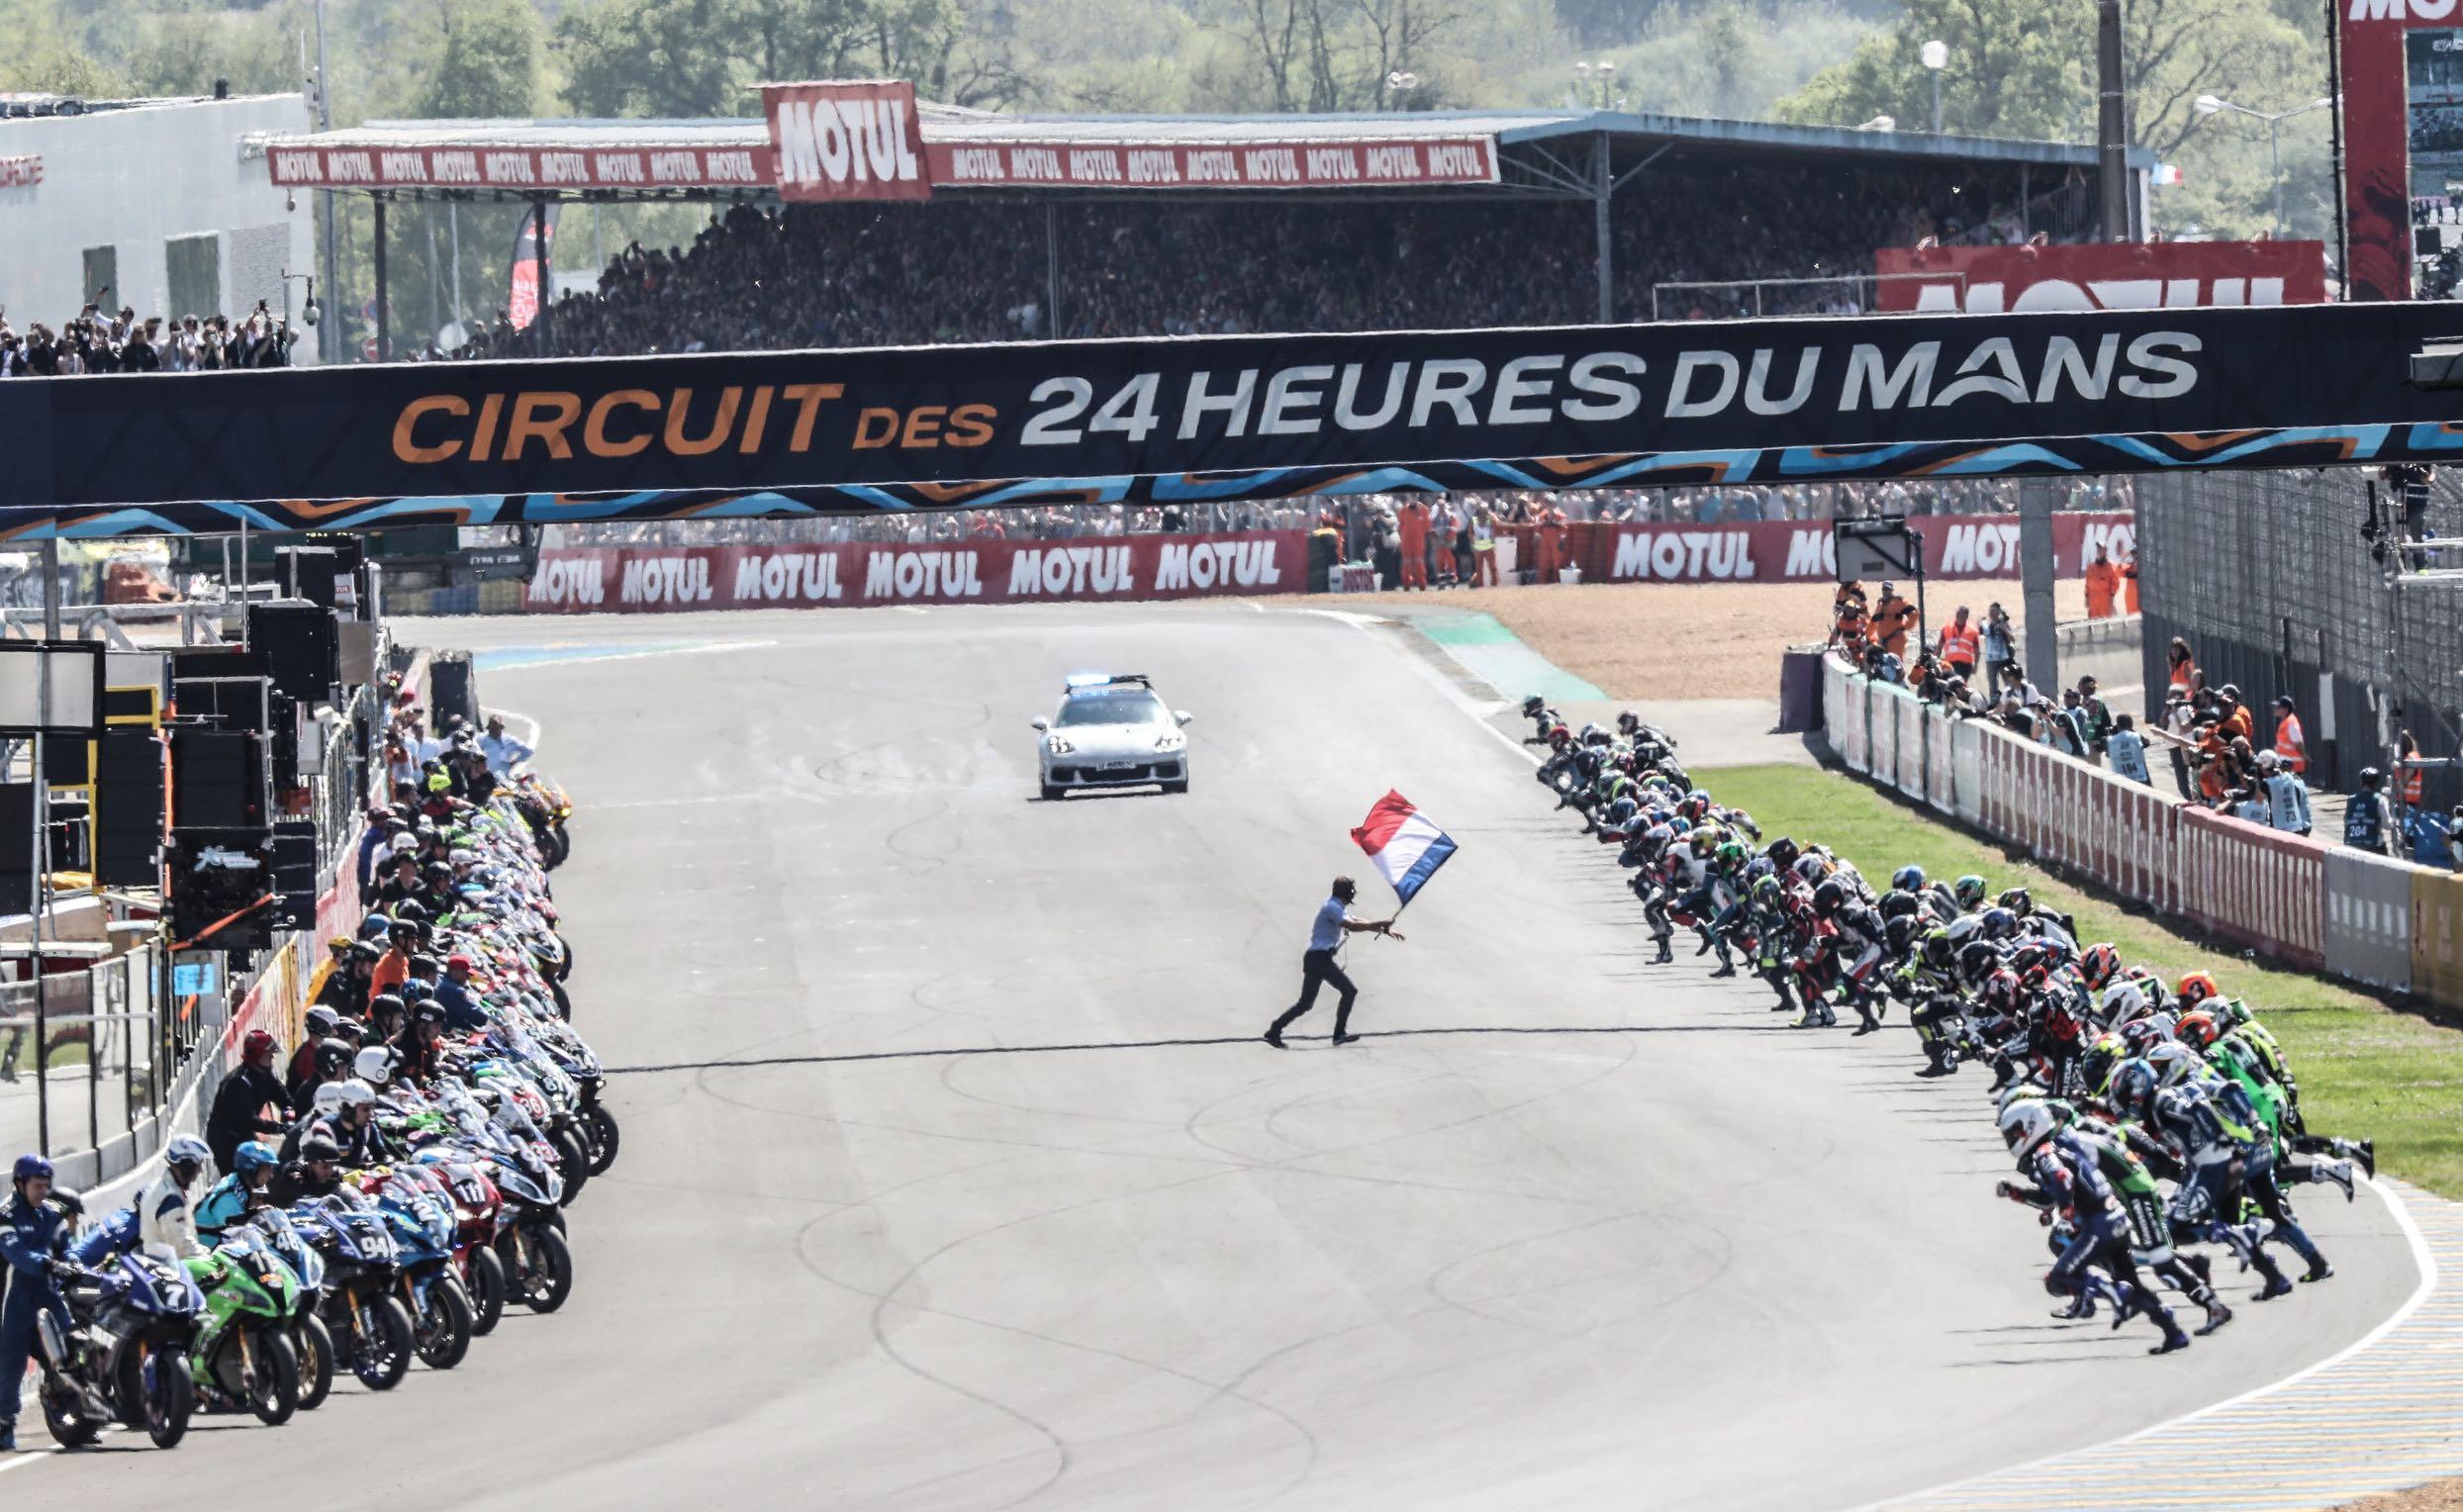 24 Heures Motos 2019 Fim Ewc Endurance World Championship